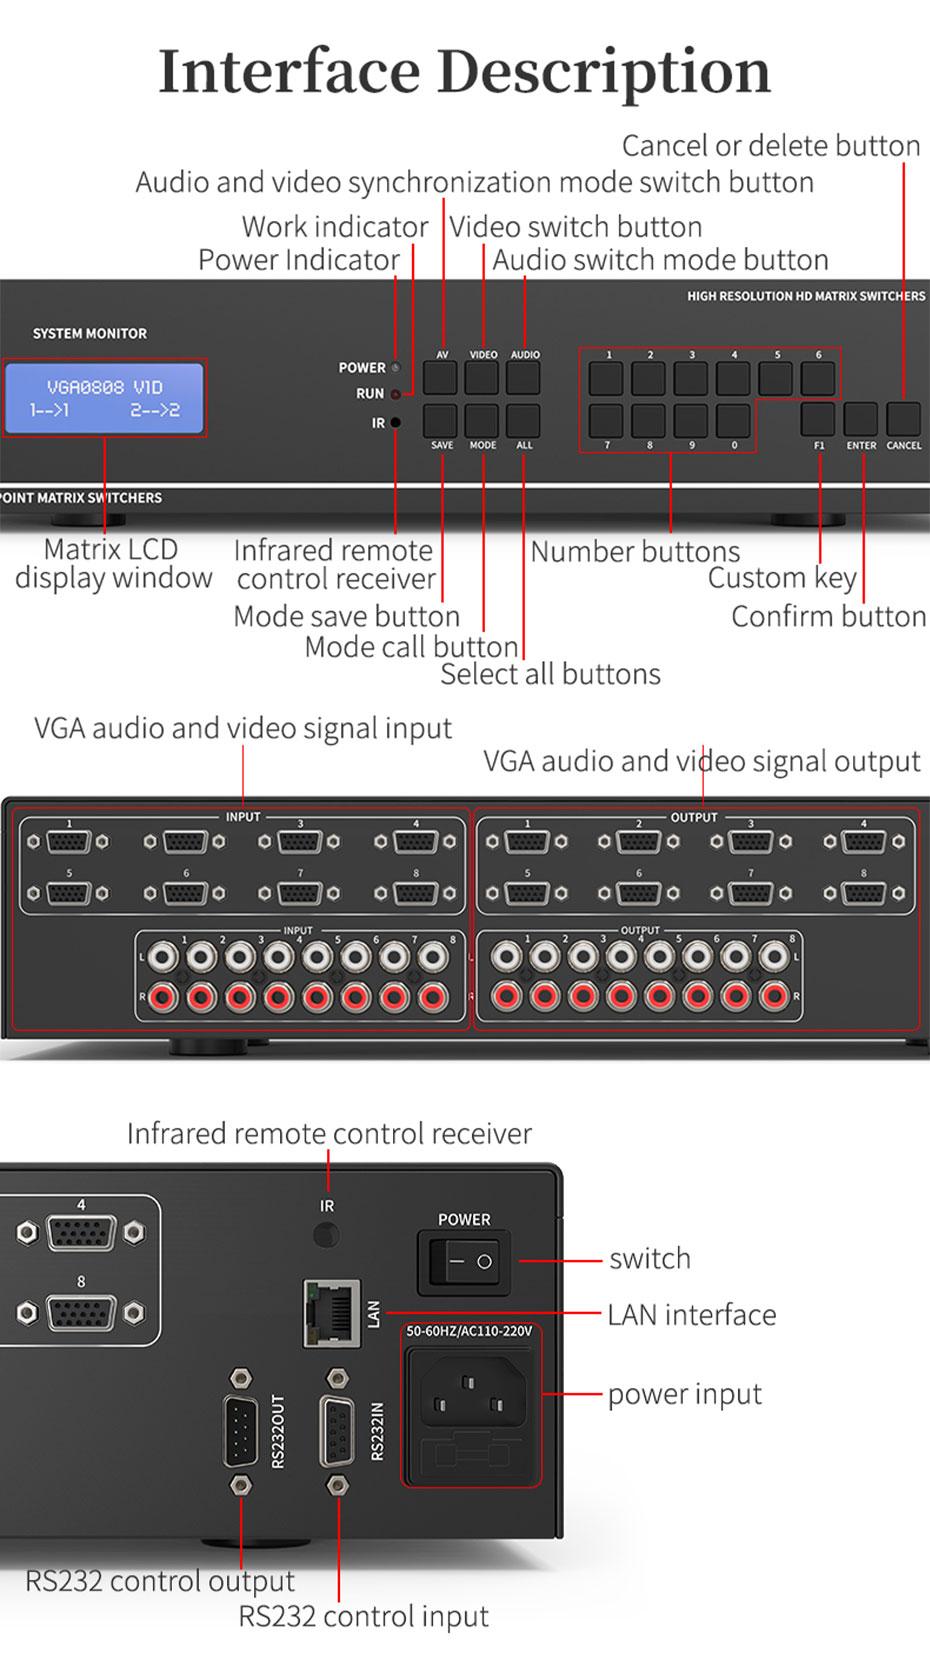 8X8 vga audio matrix switcher V818A interface description